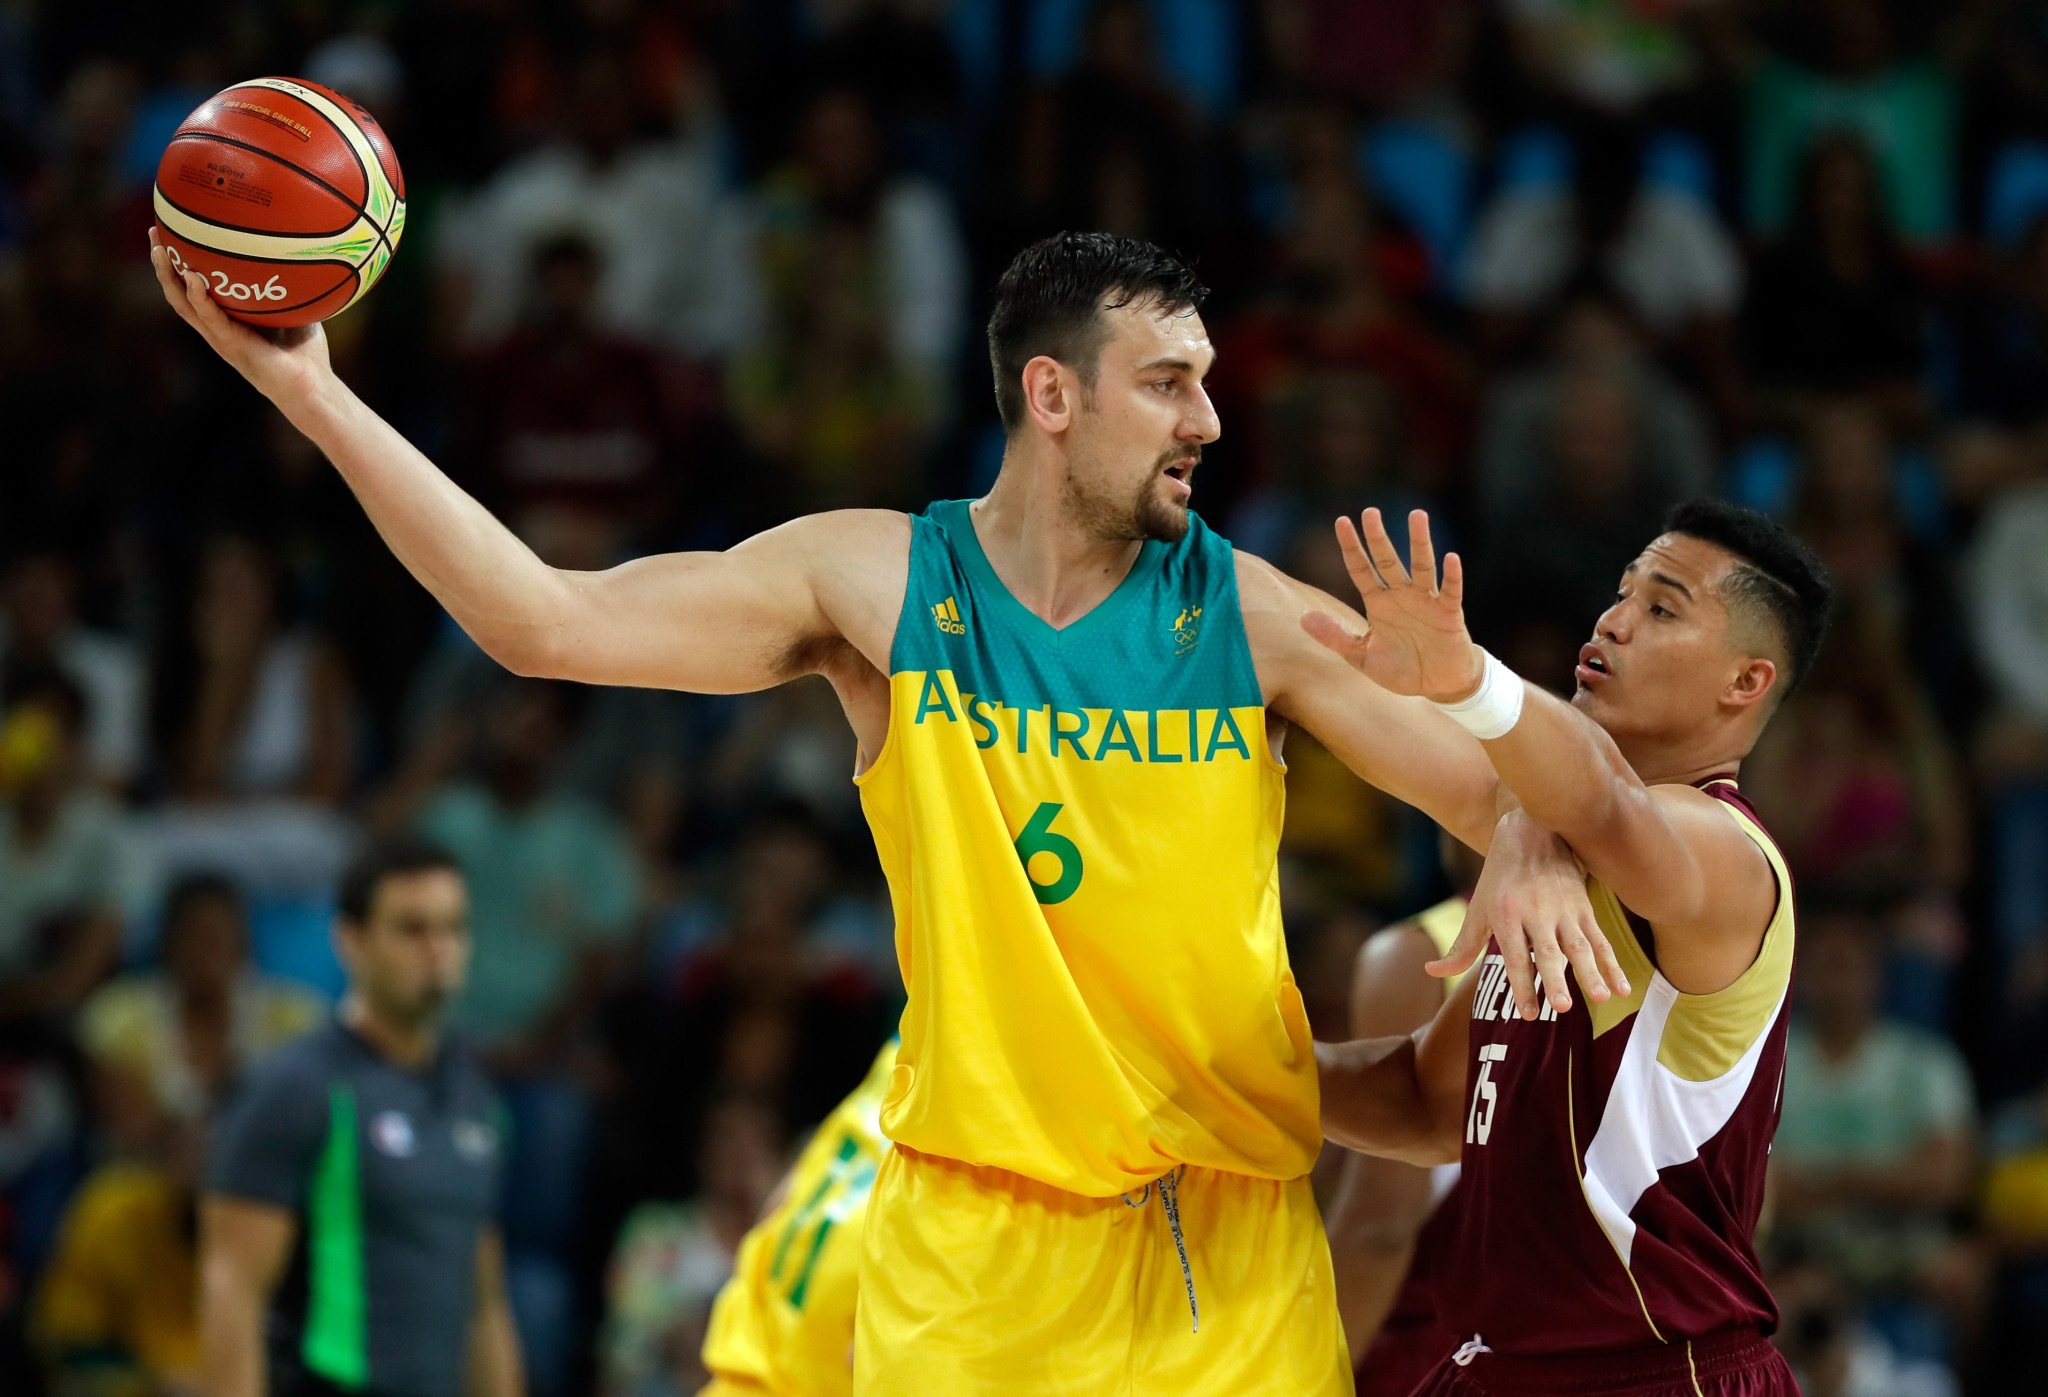 Australian basketball player Andrew Bogut said continuing was